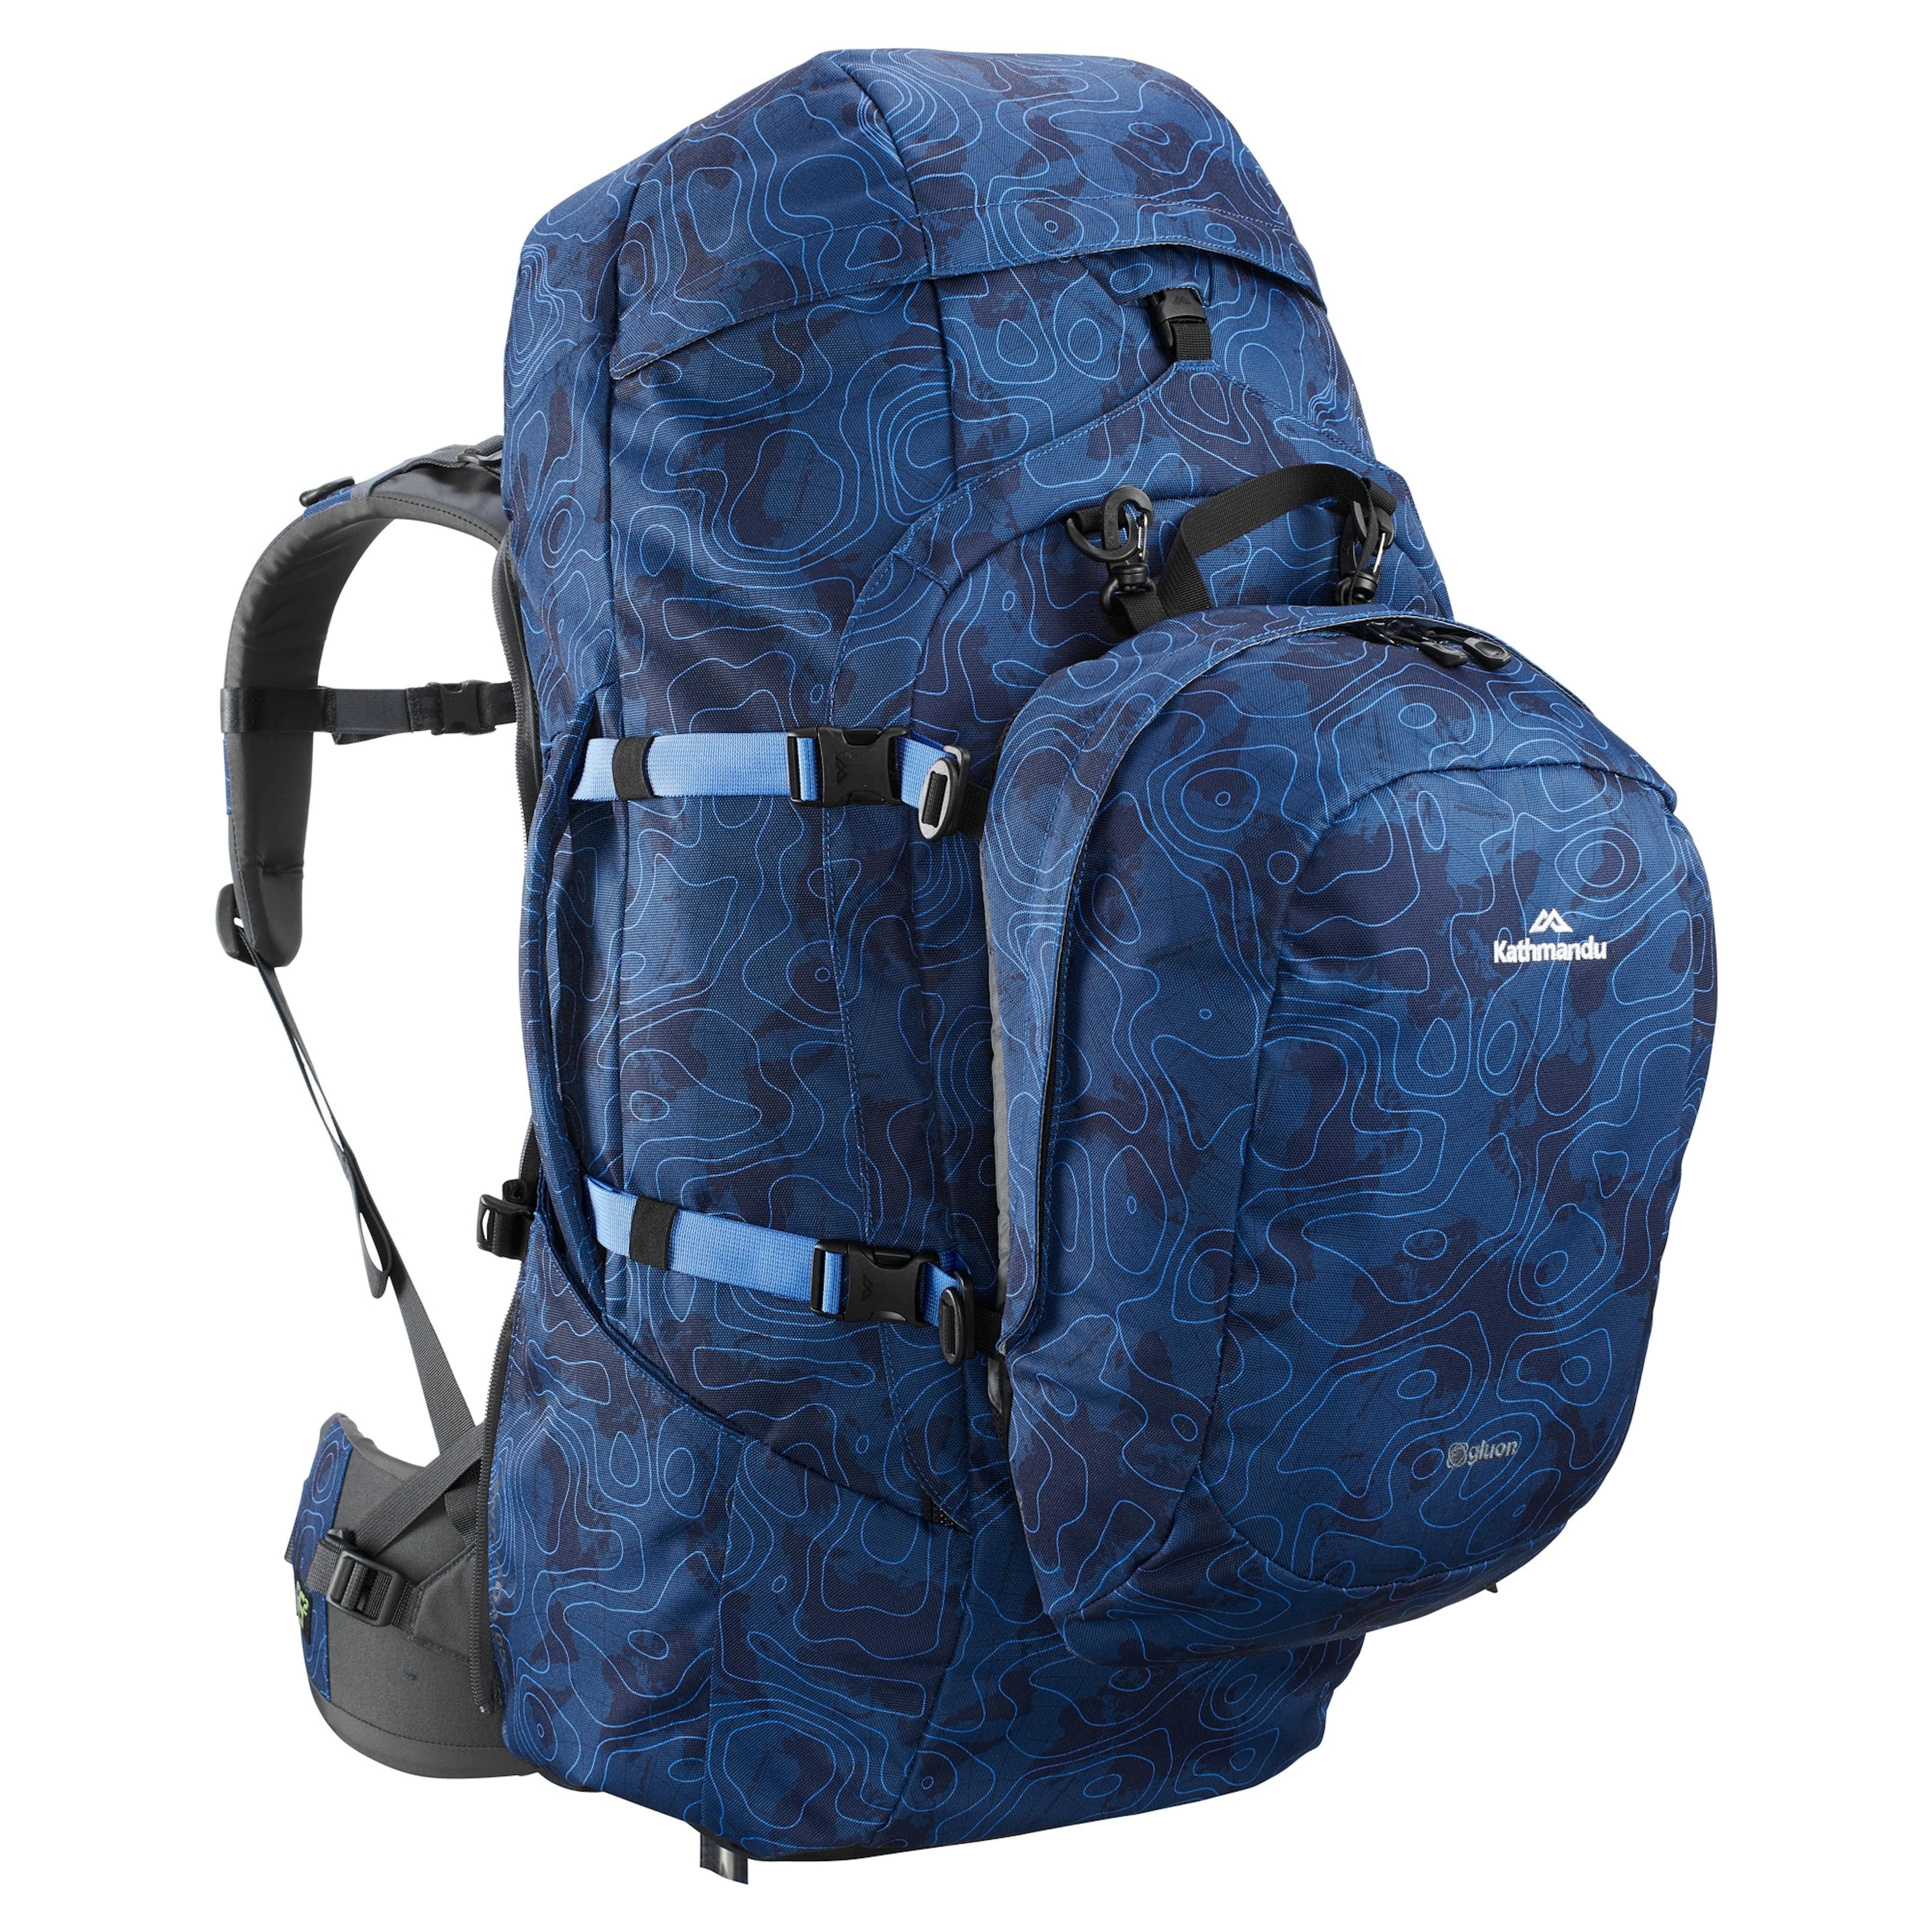 Entrada 65L Backpack v2 - Midnight Blue 69e3fcab28